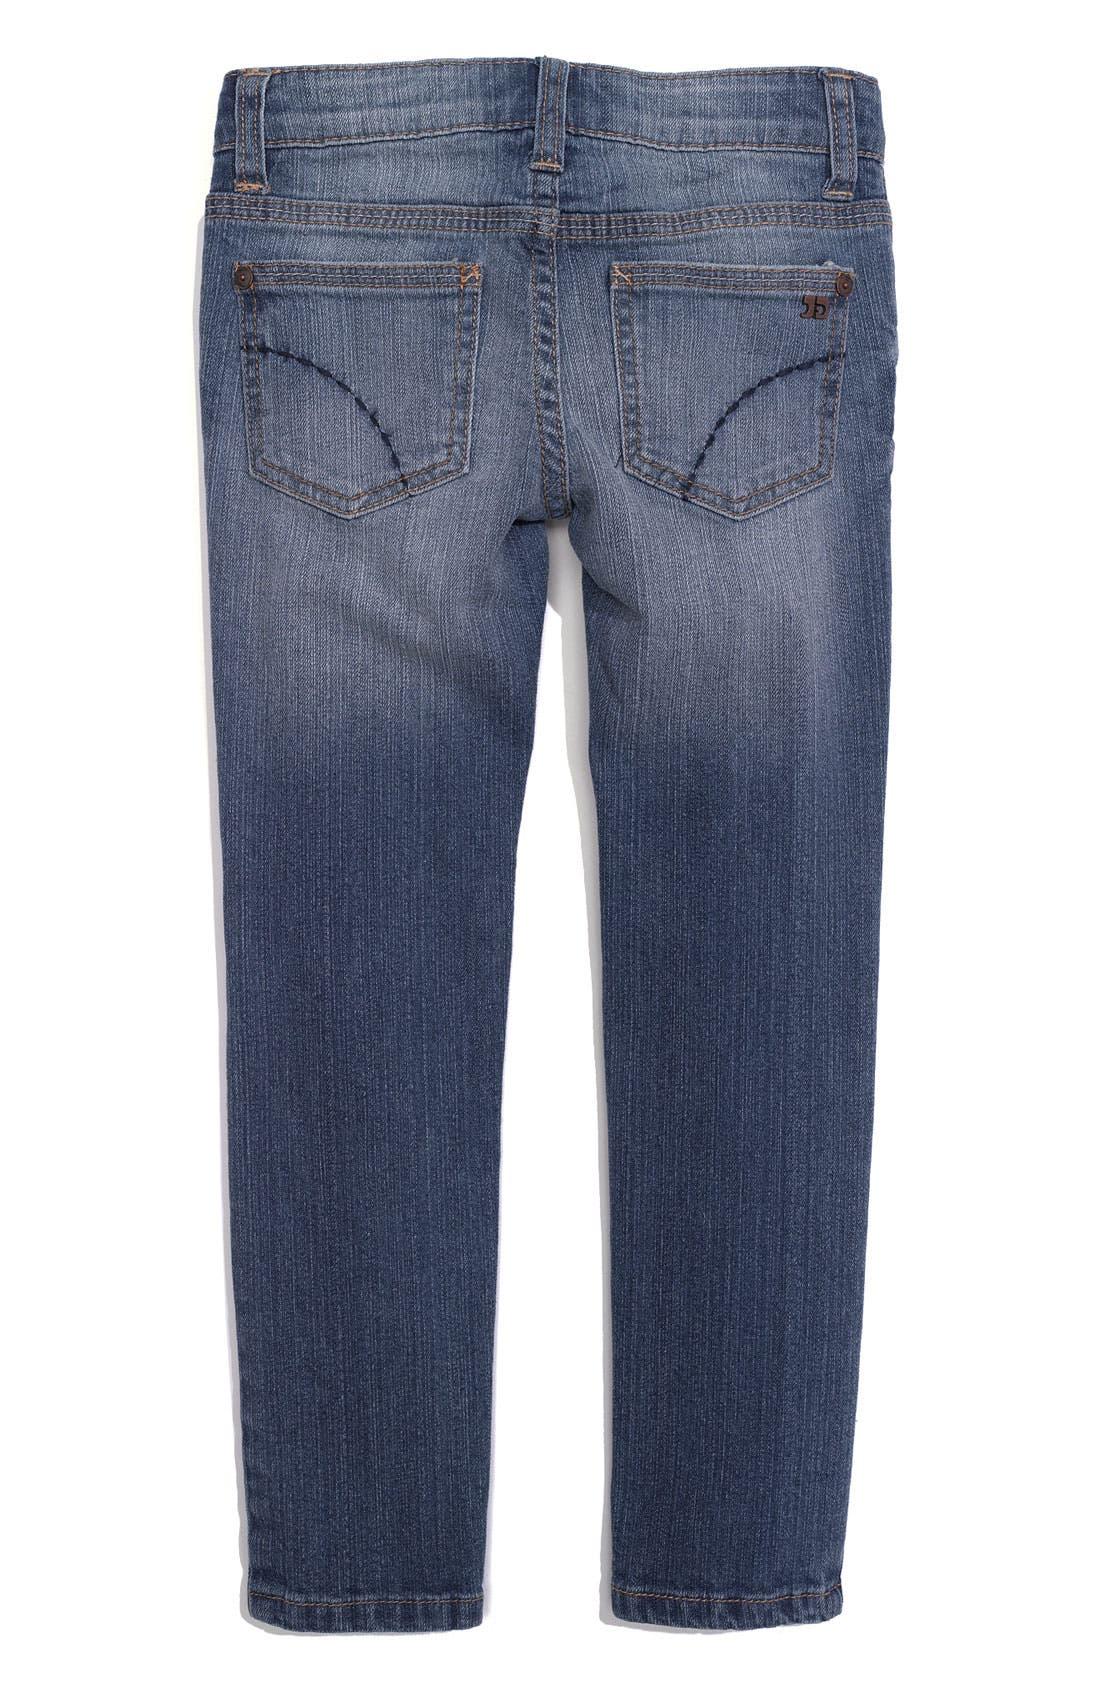 Alternate Image 1 Selected - Joe's Skinny Jeans (Toddler)